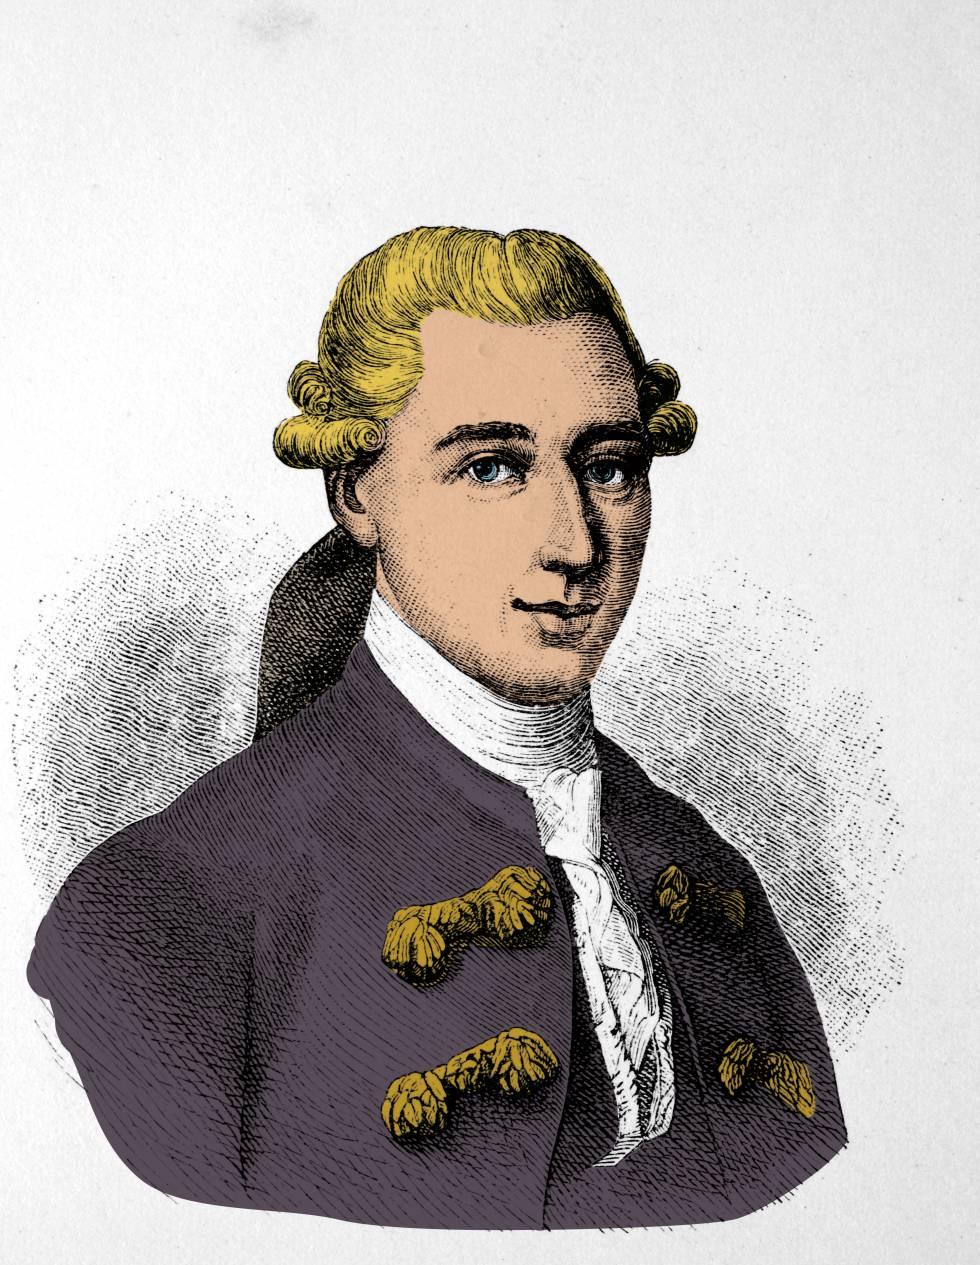 Ilustración de Johann Friedrich Struensee.